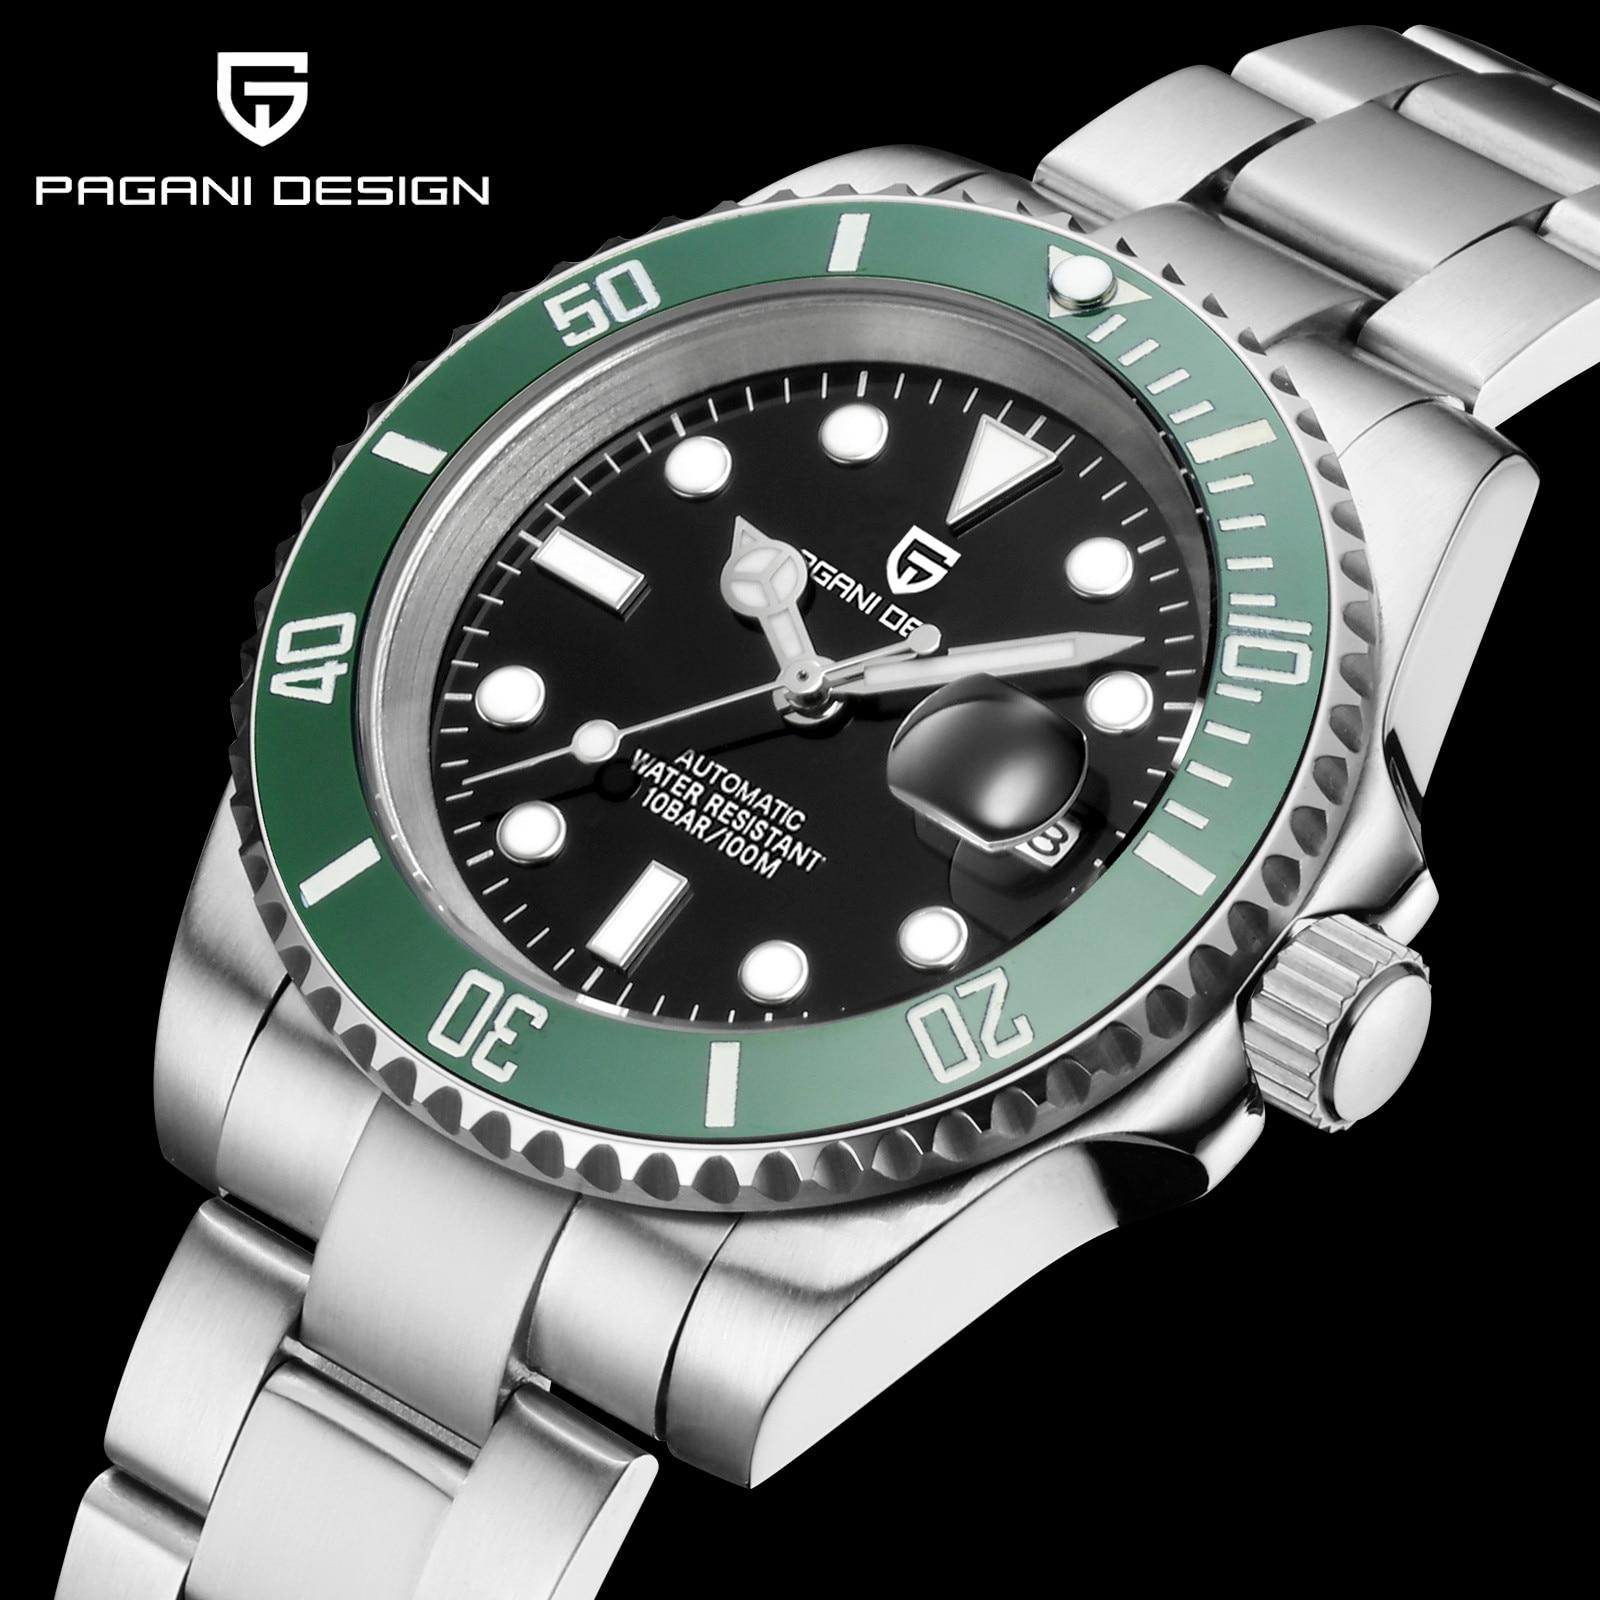 2021 Pagani تصميم جديد 40 مللي متر ساعات آلية فاخرة رجال الأعمال ساعة أوتوماتيكية العلامة التجارية الأعلى الفولاذ المقاوم للصدأ مقاوم للماء على مد...